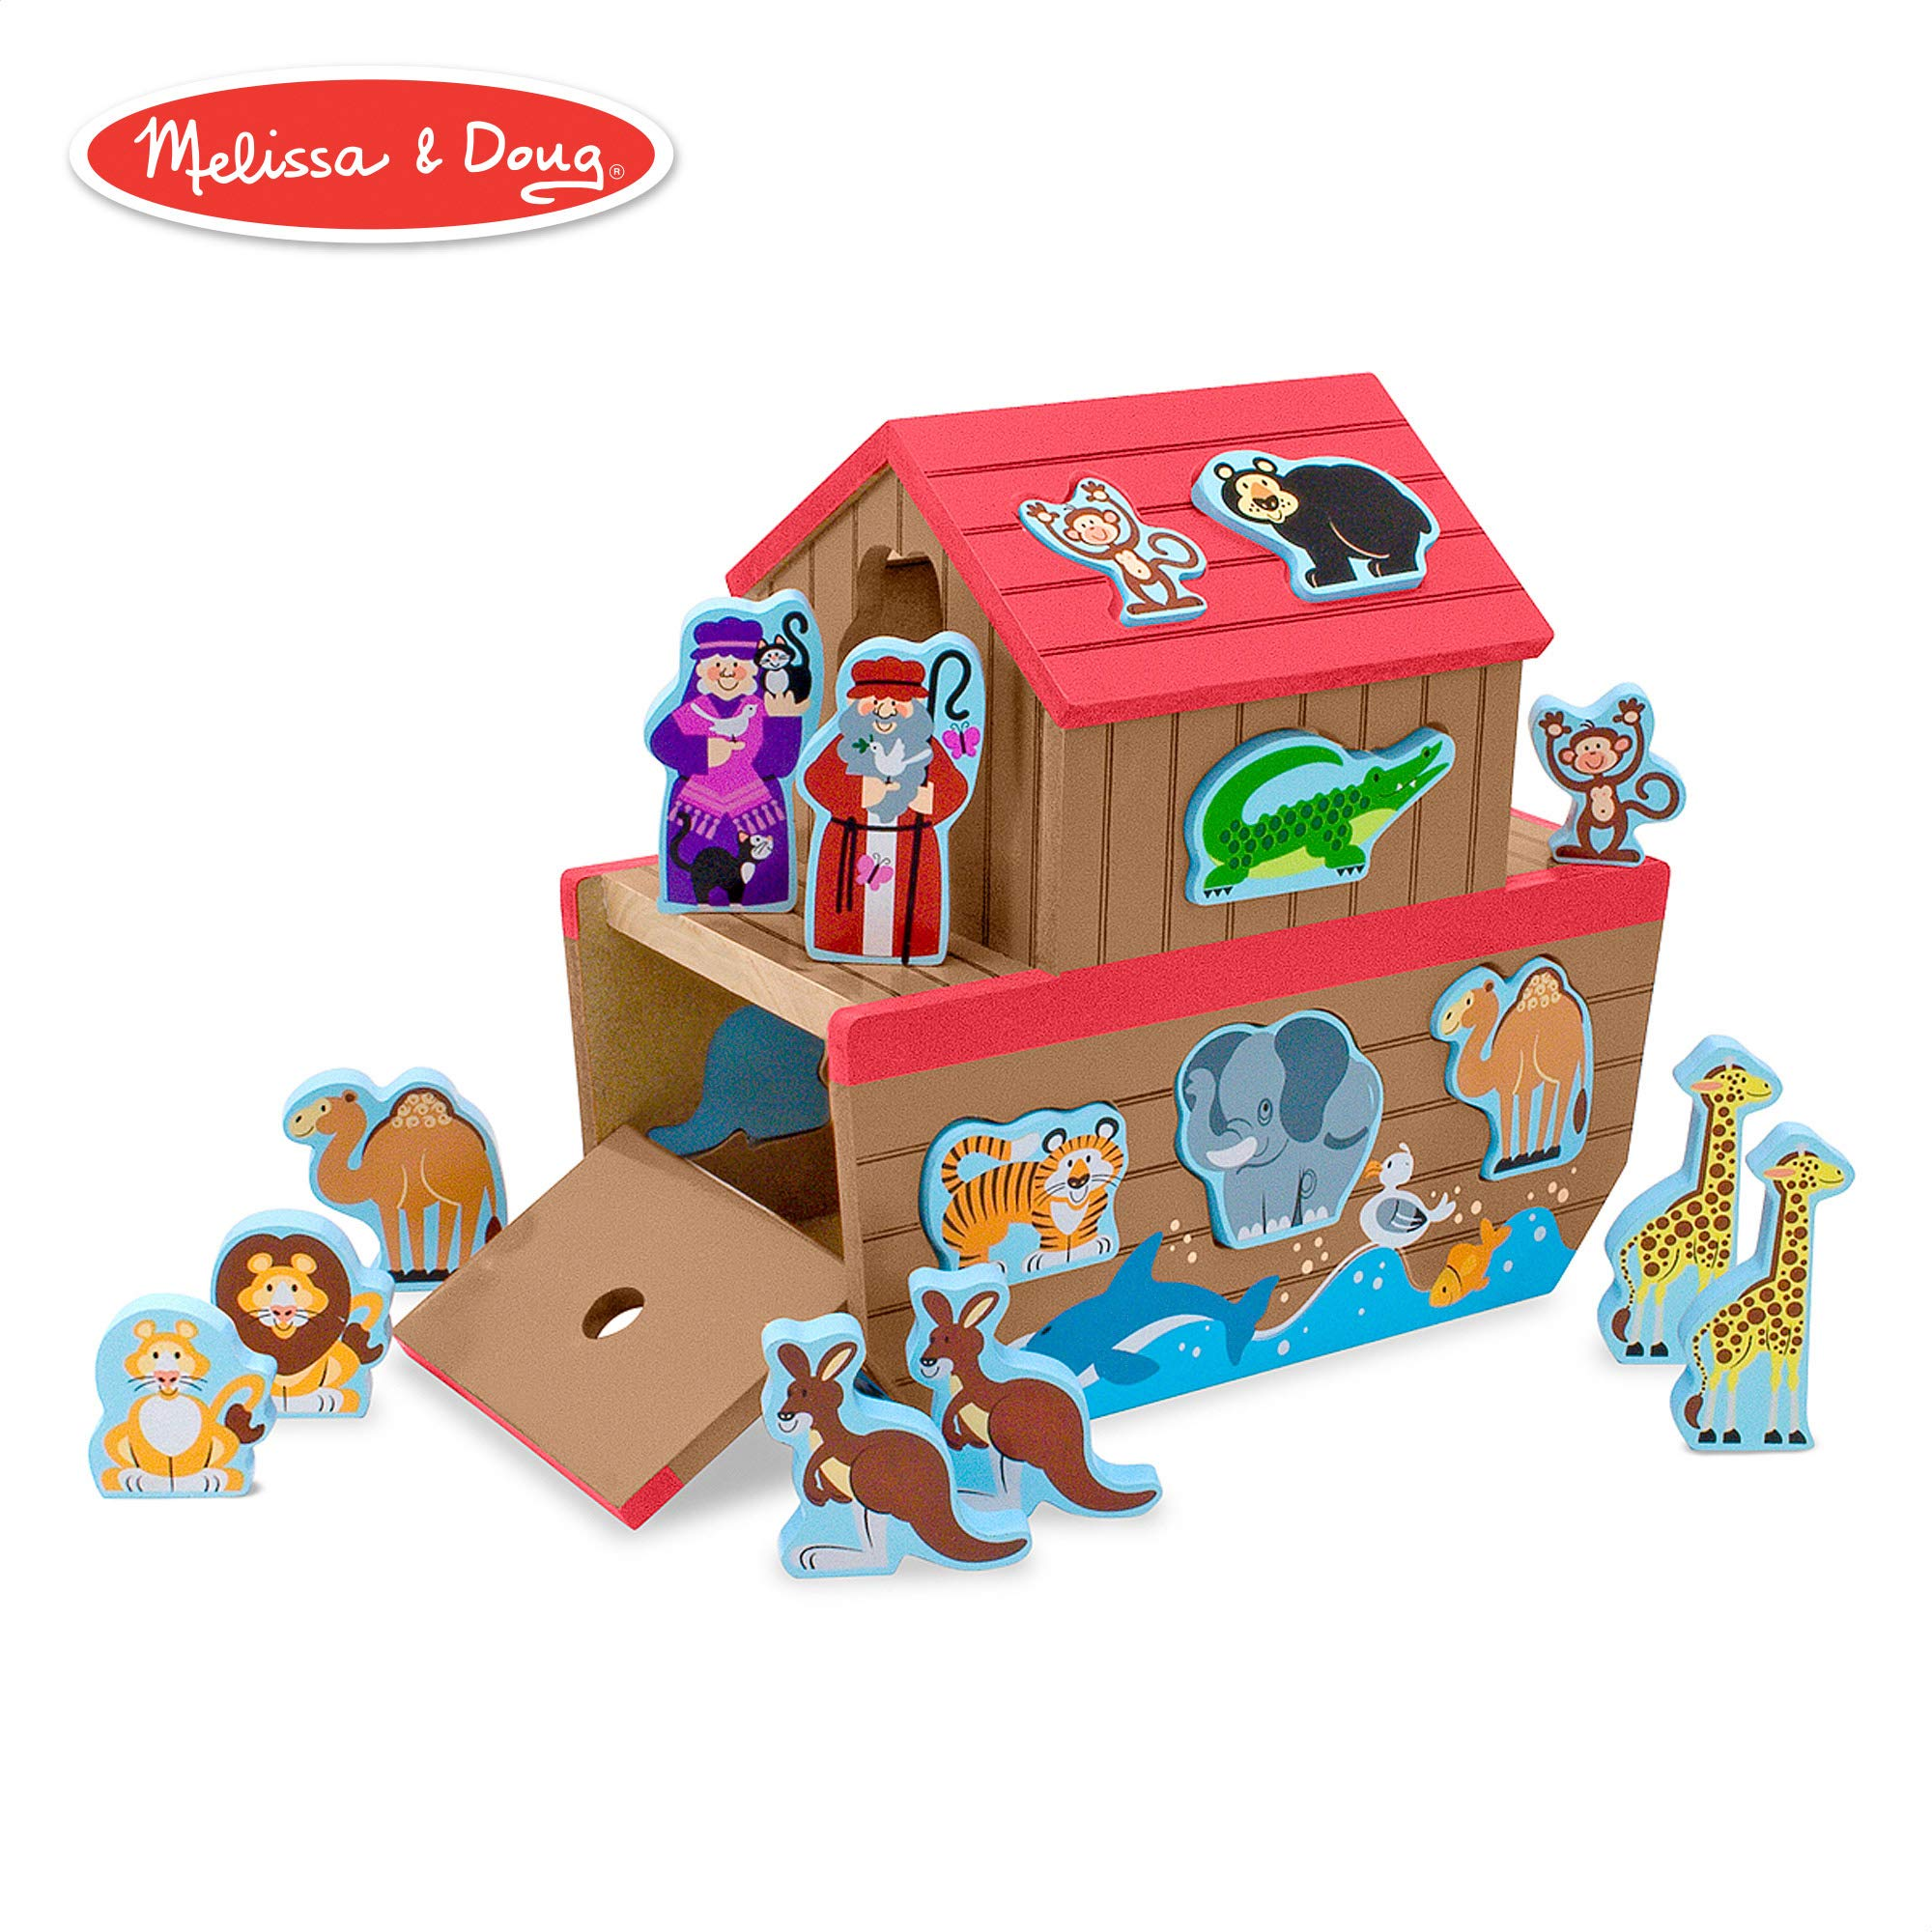 Melissa & Doug Noah's Ark Wooden Shape Sorter Educational Toy (28 pcs) by Melissa & Doug